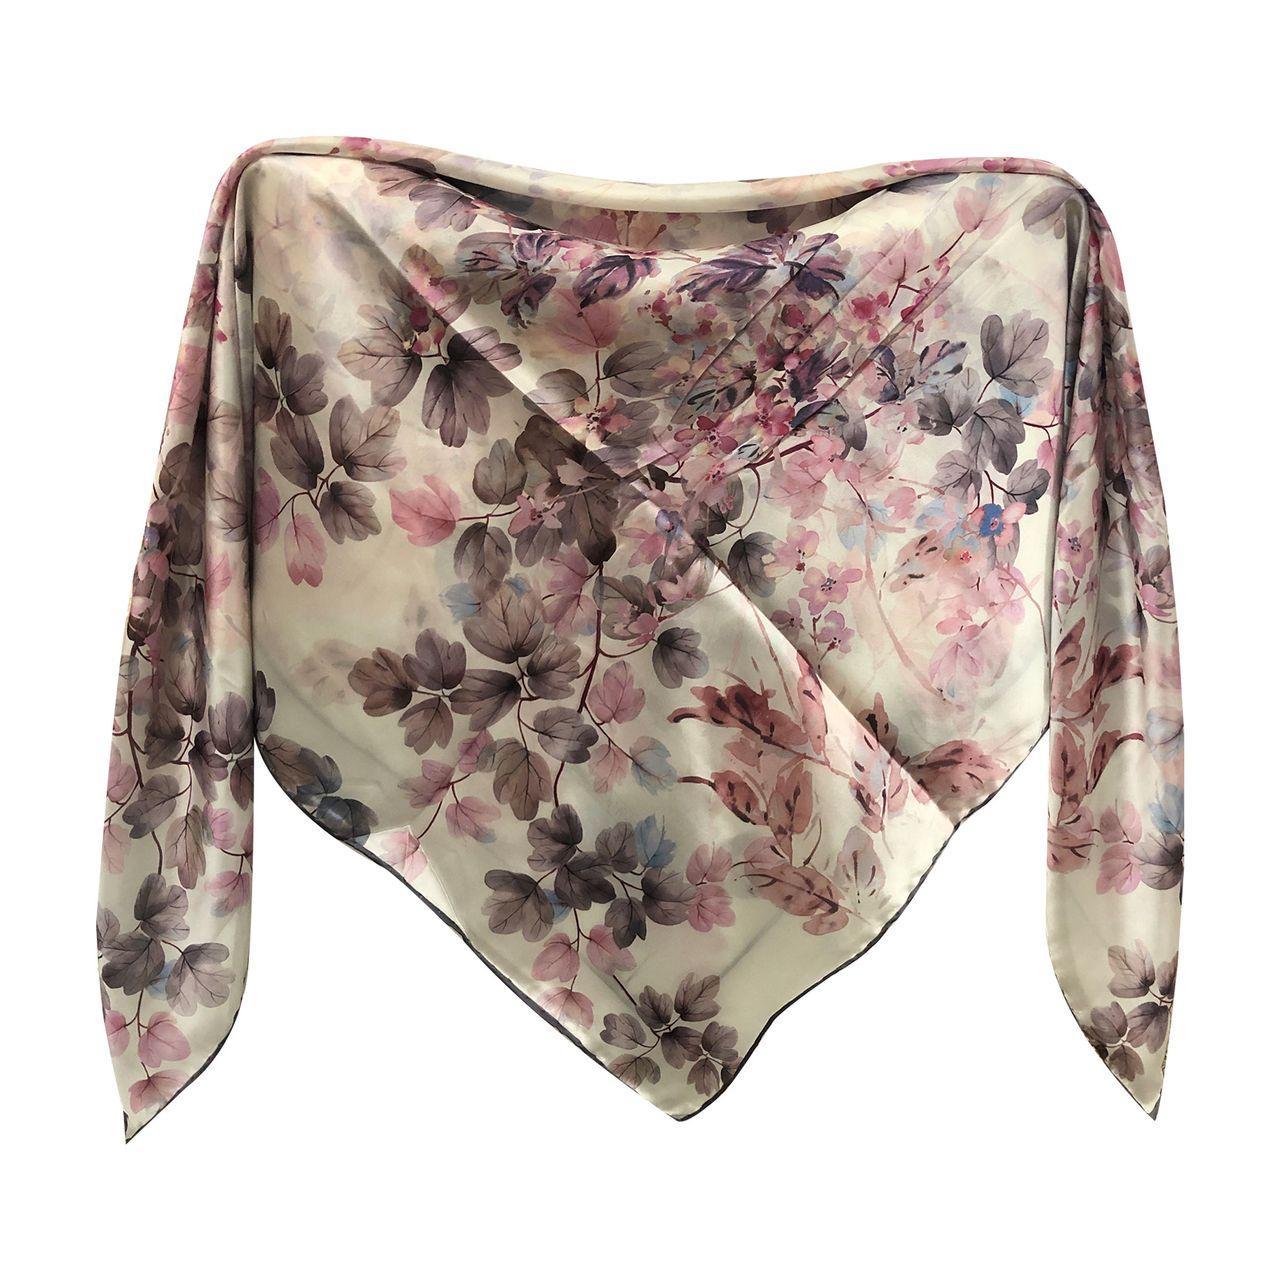 روسری زنانه کد 234